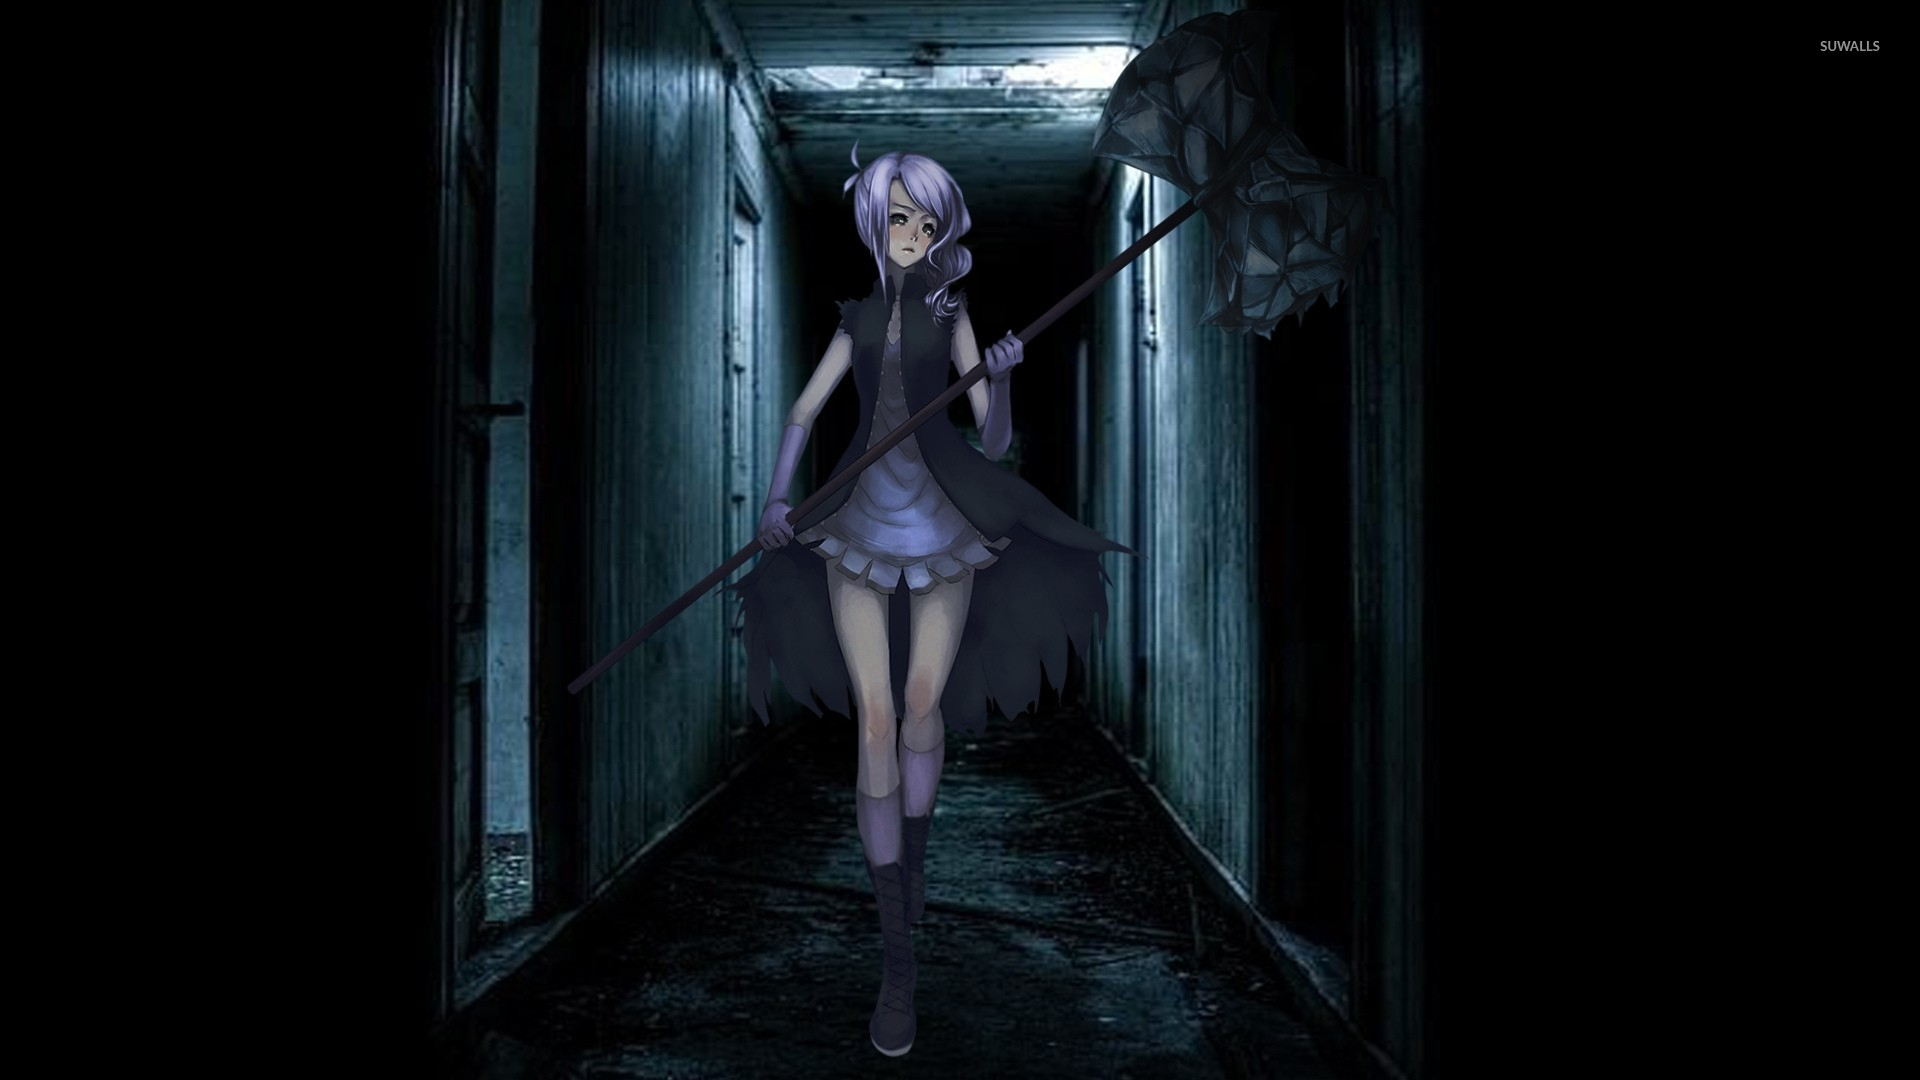 Girl With Purple Hair Walking Through A Dark Hallway Wallpaper